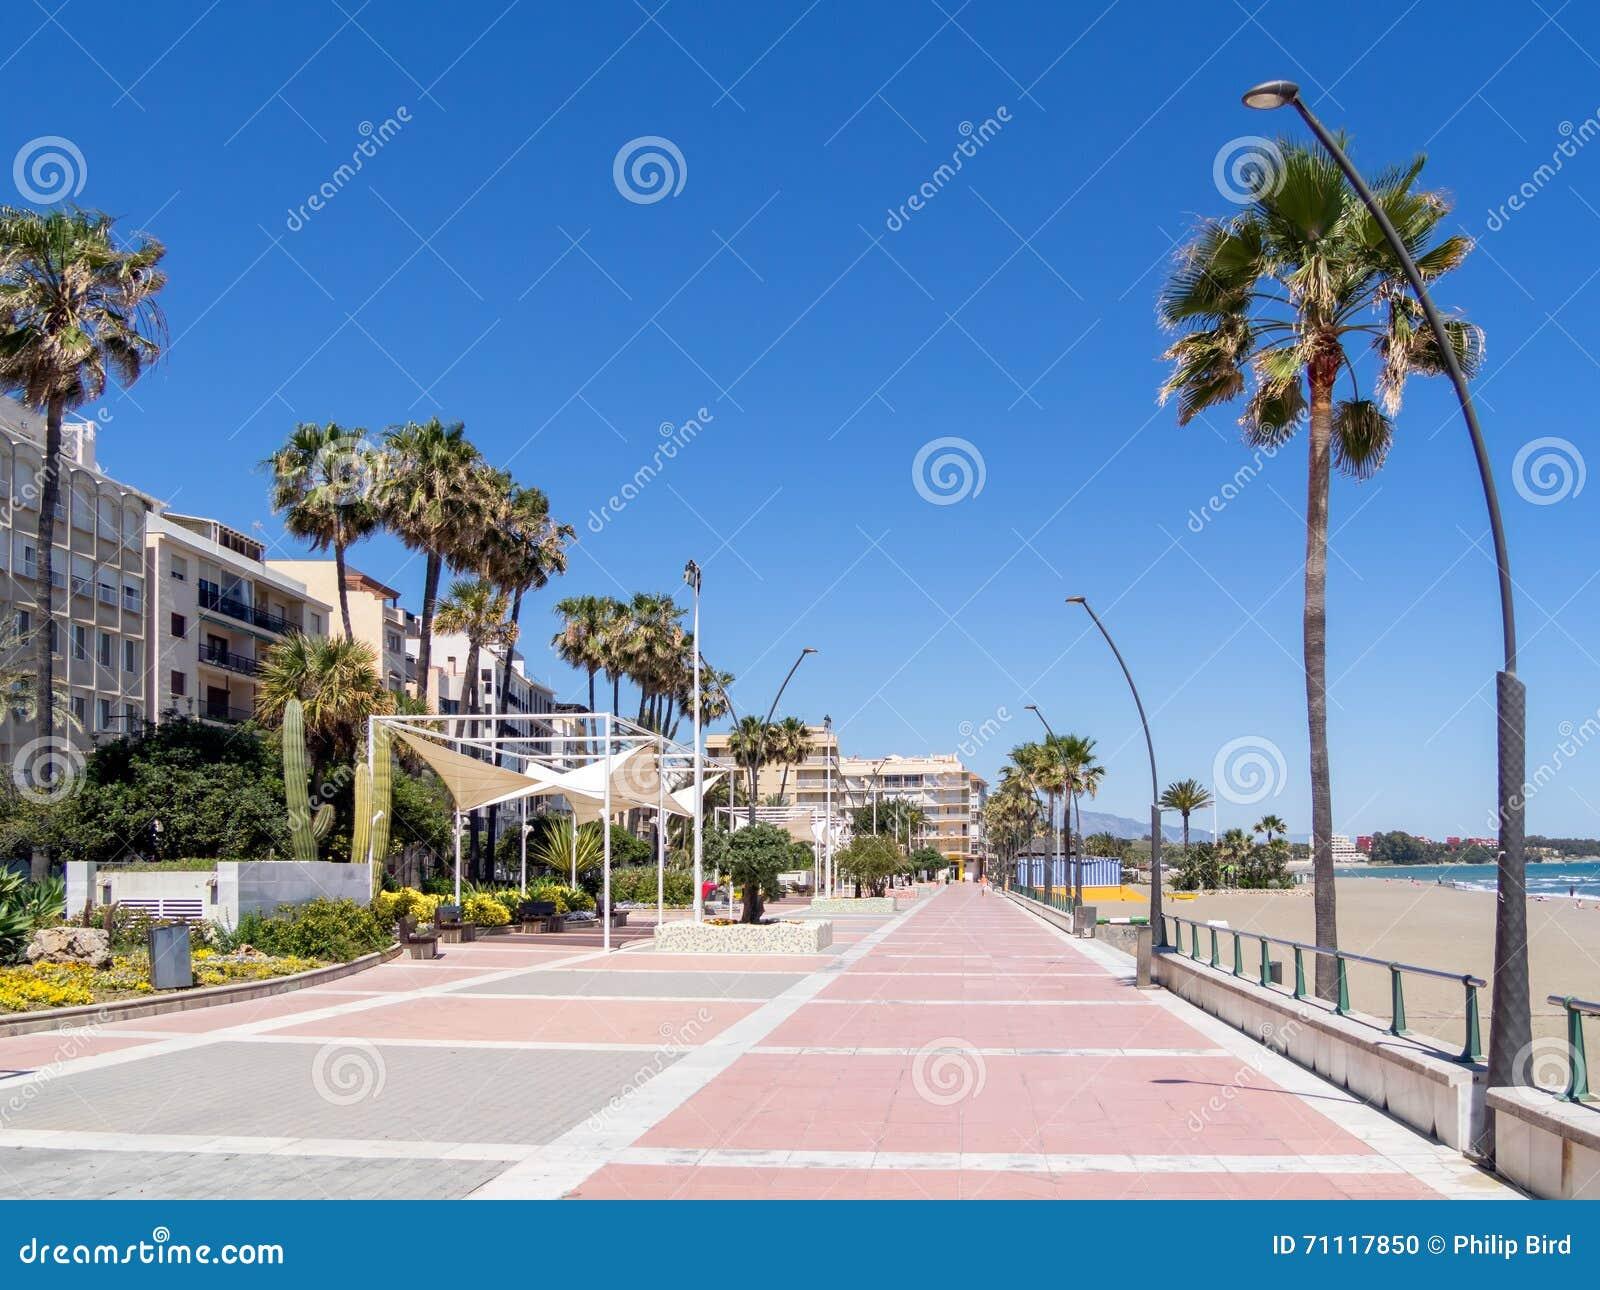 ESTEPONA, ANDALUCIA/SPAIN - 5 ΜΑΐΟΥ: Περίπατος Estepona Ισπανία